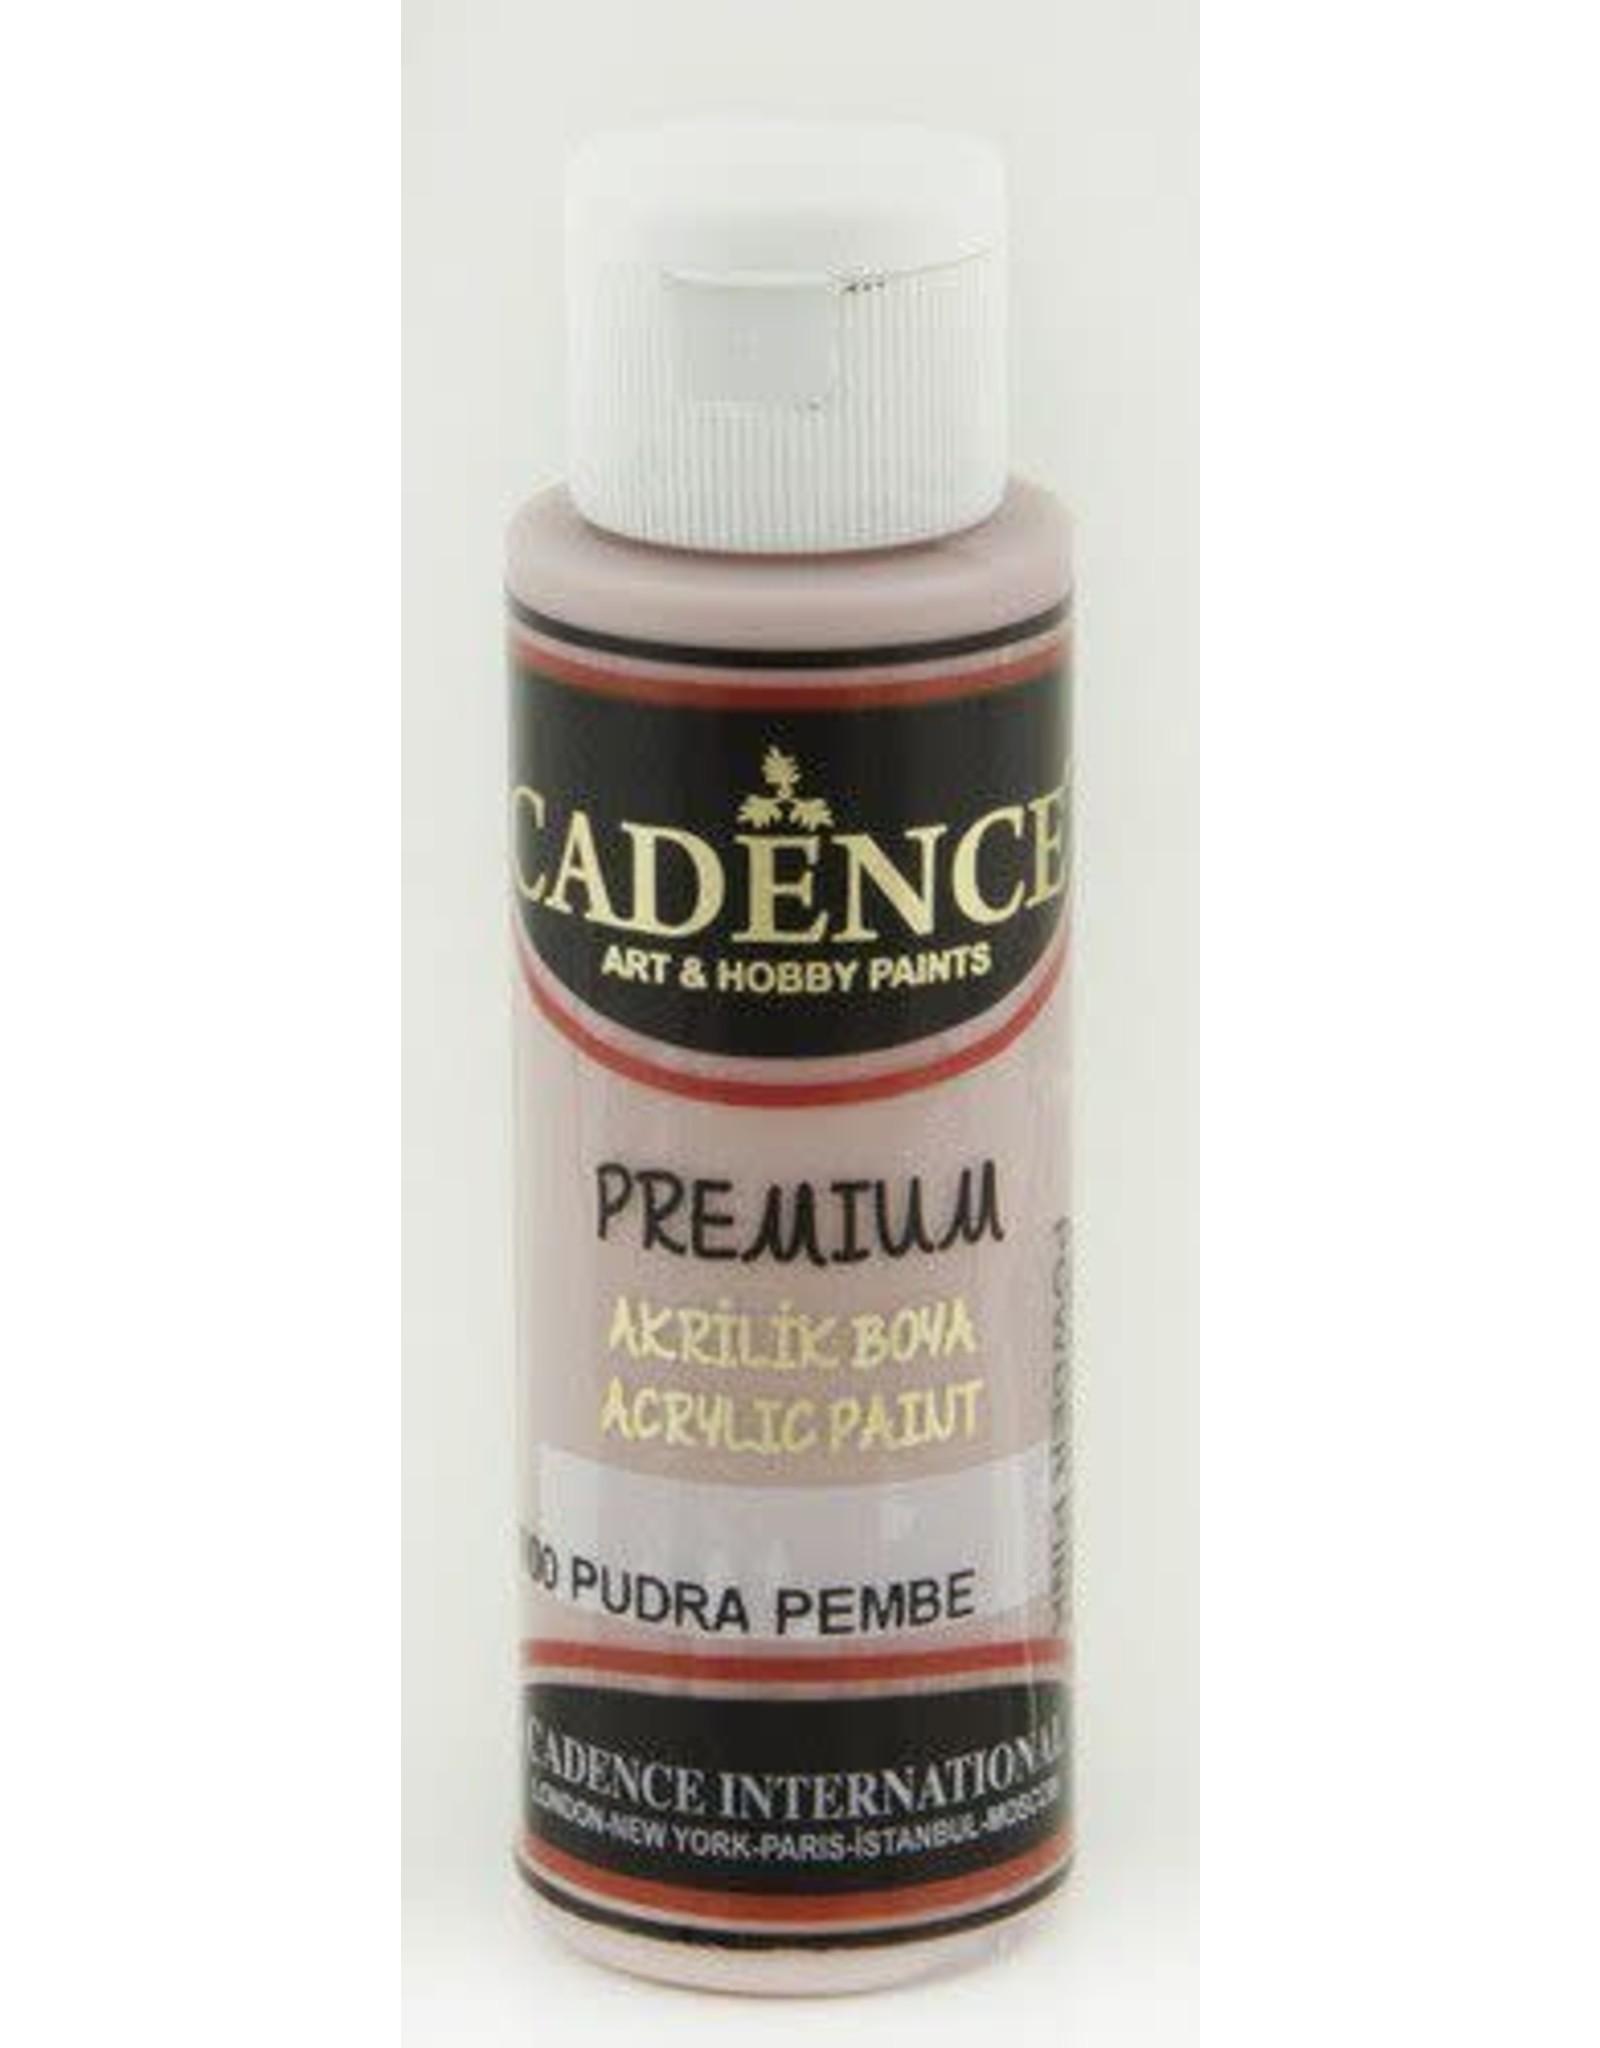 Cadence Cadence Premium acrylverf (semi mat) Poederroze